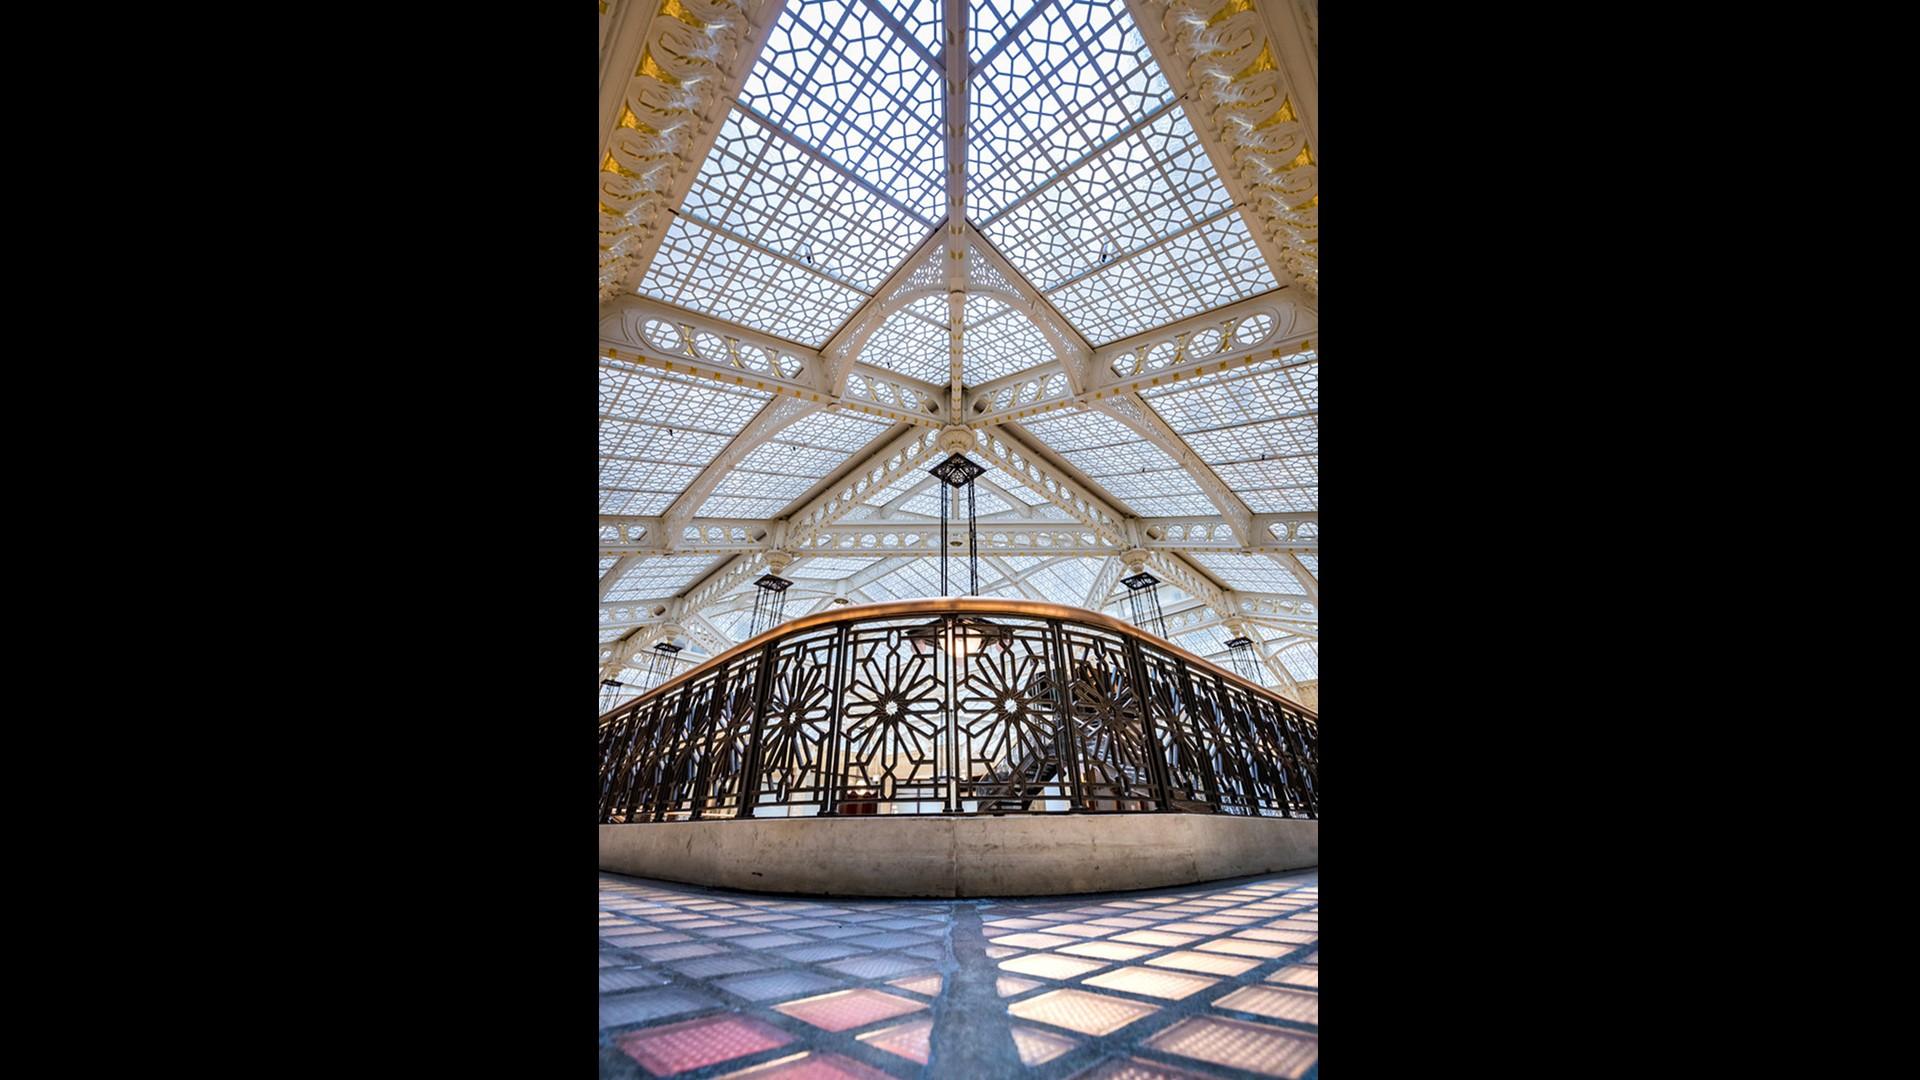 Architecture | Photographer: Jeff GoldbergCurator: Steven Inglima